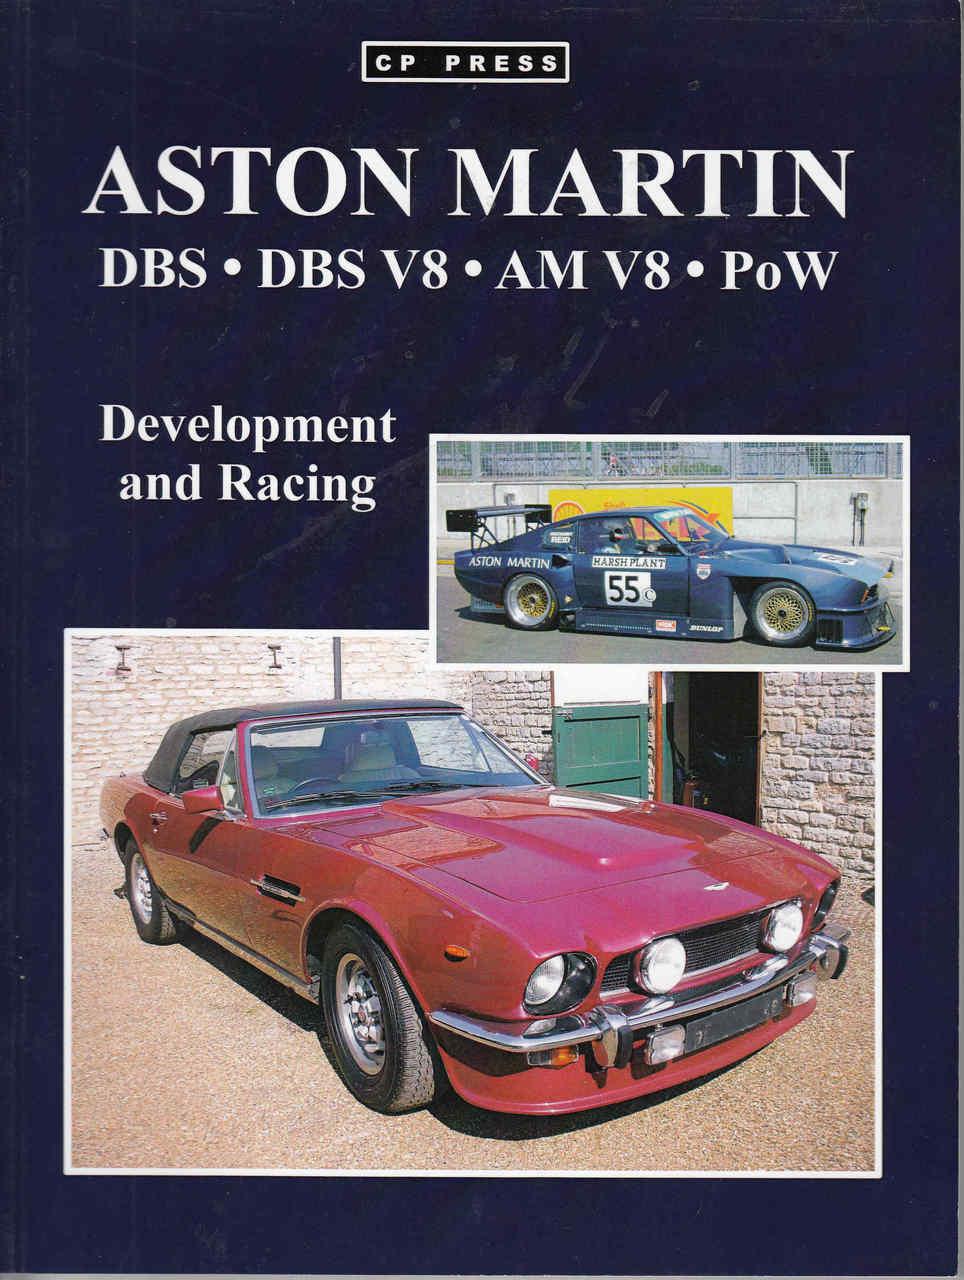 aston martin dbs. dbs v8. am v8. pow - c p press